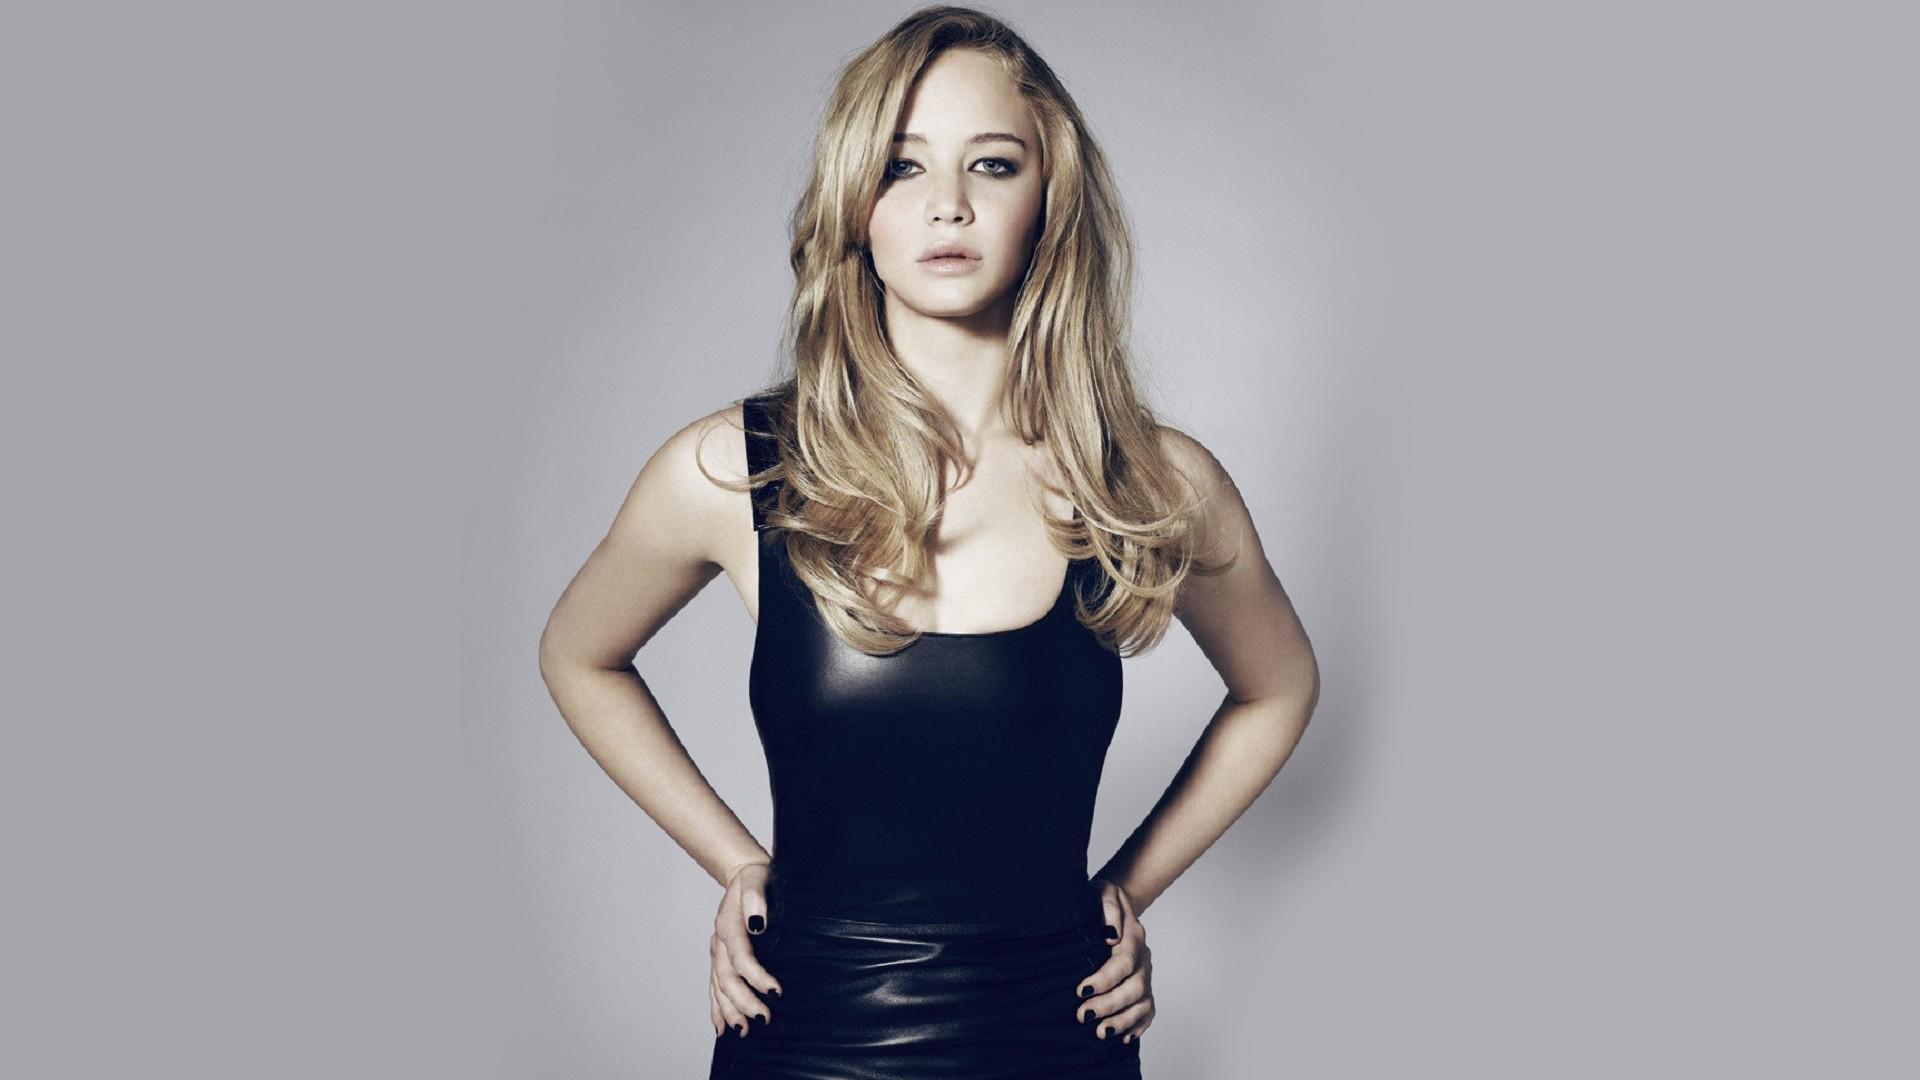 Jennifer Lawrence 6 Hd Wallpaper